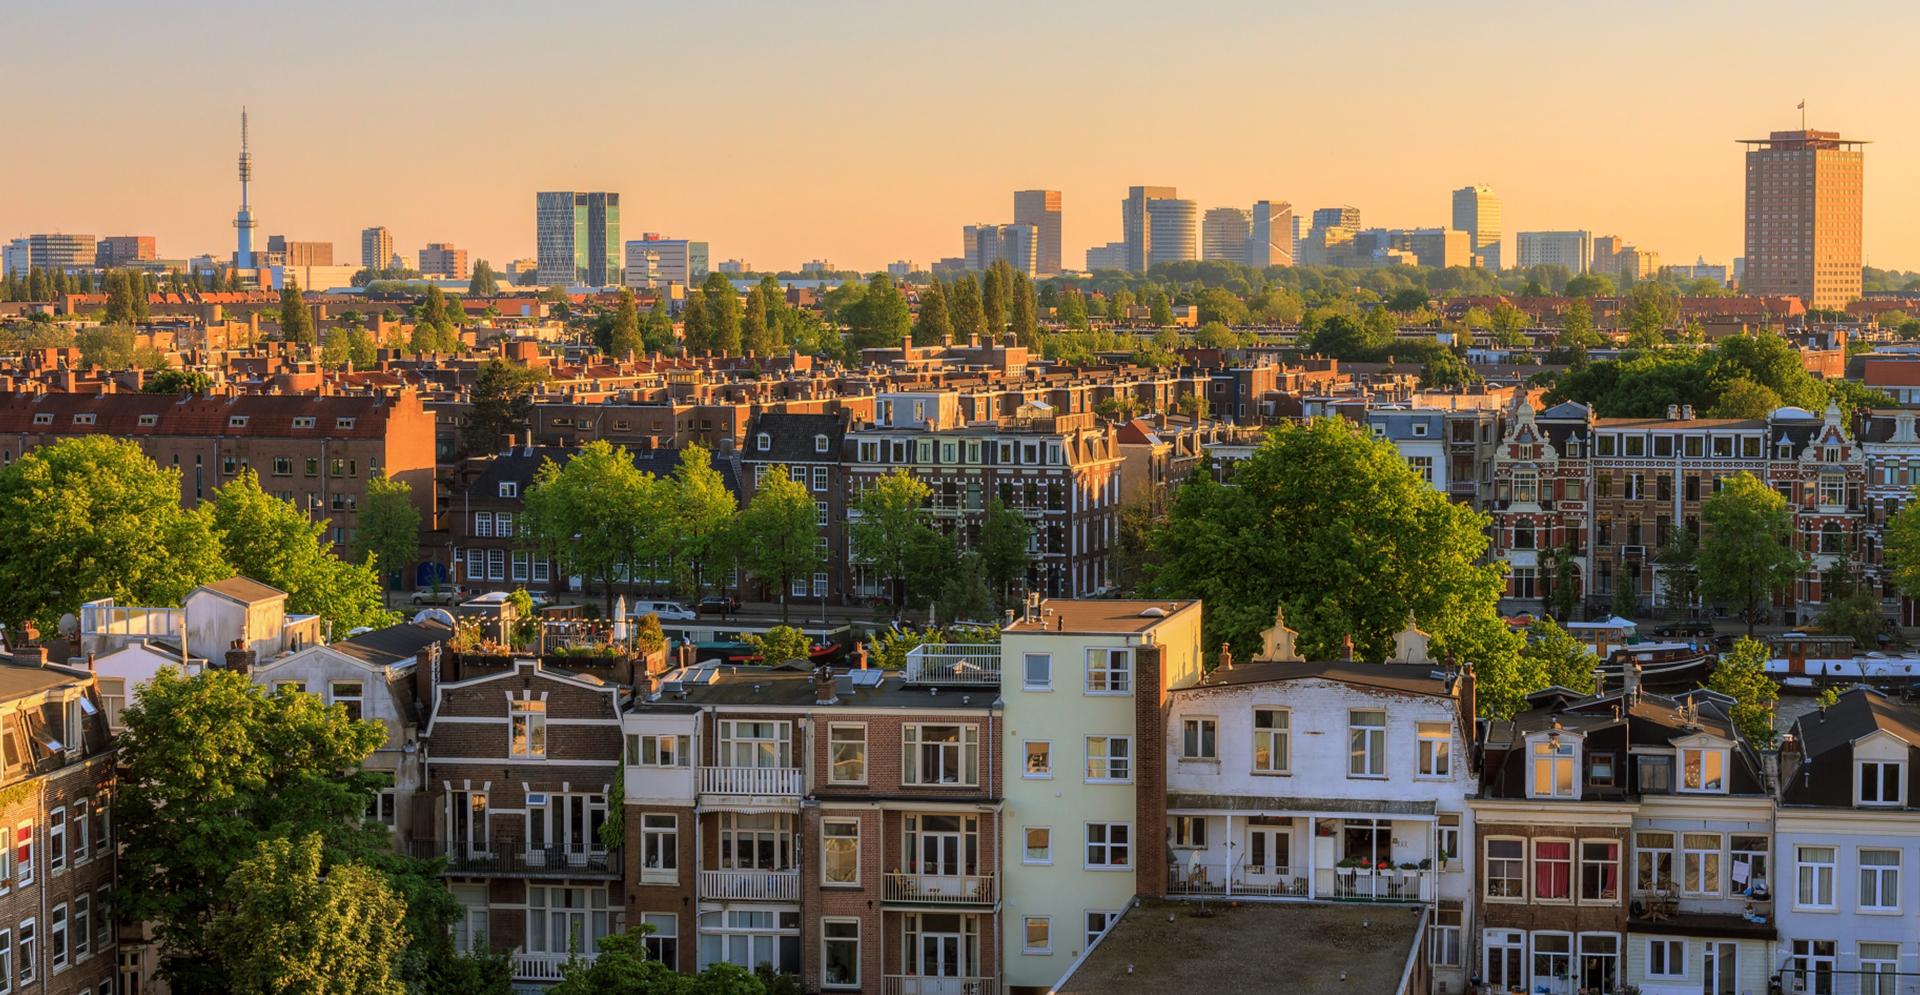 Woningen in Amsterdam Zuid-oost